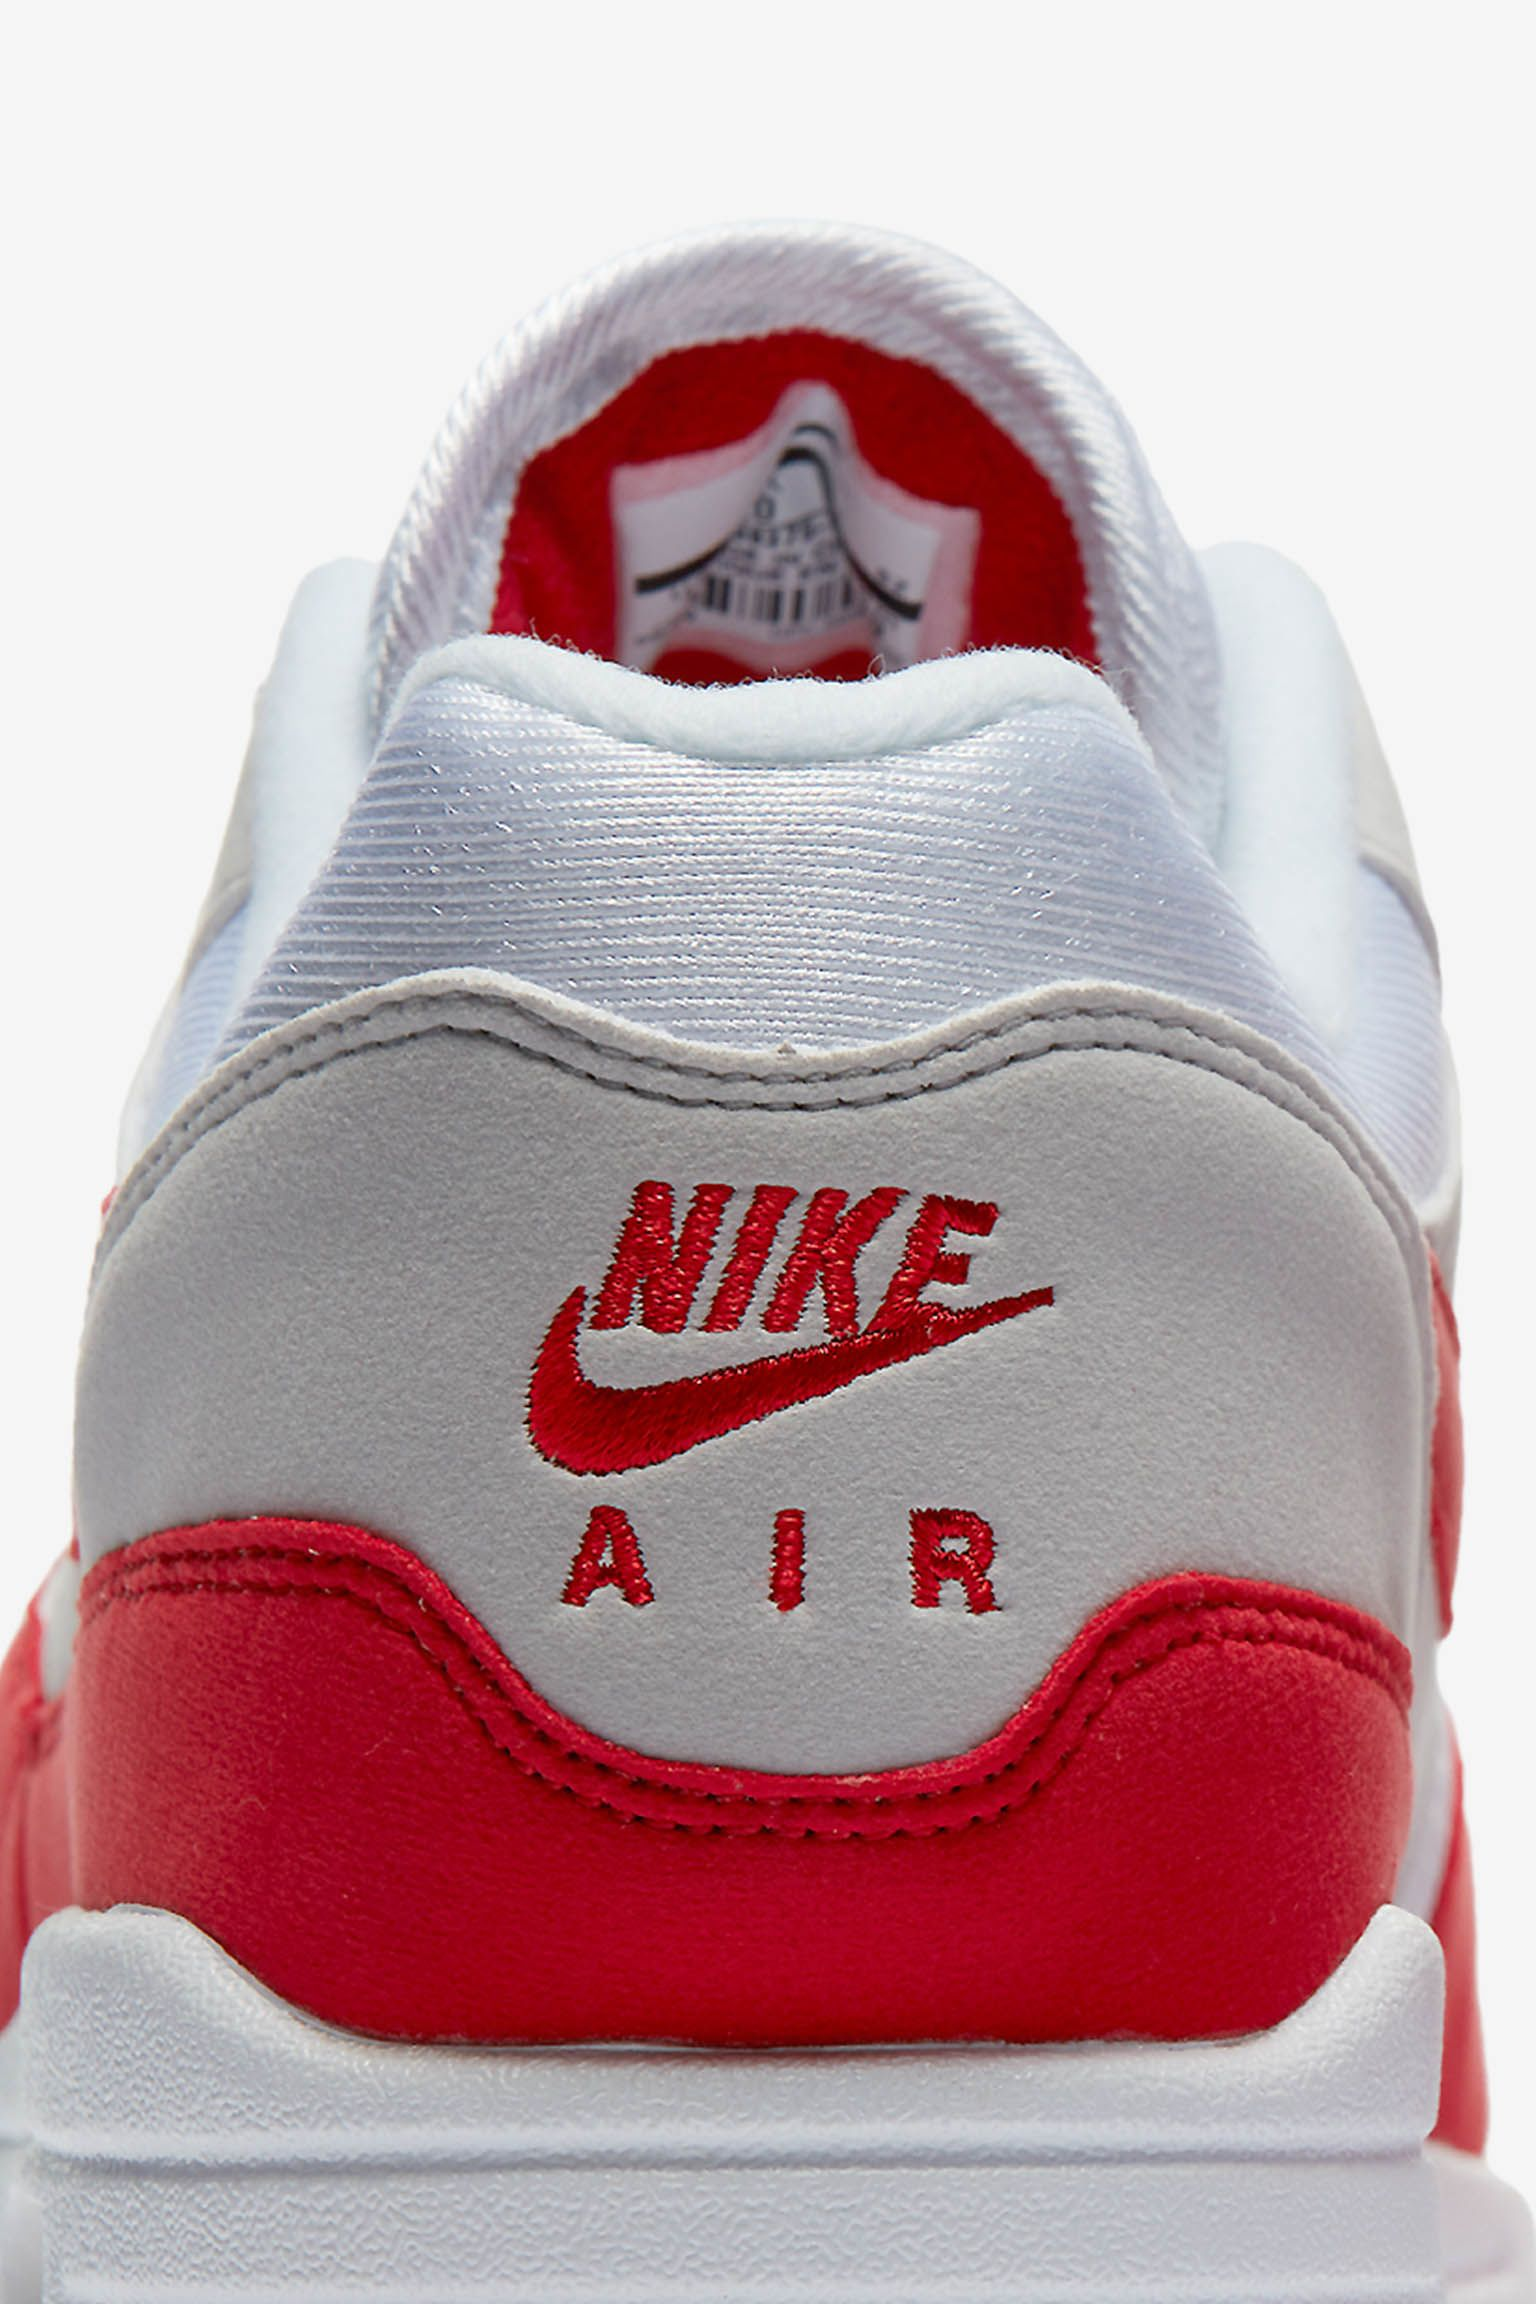 160b3dc90a nike-air-max-1-anniversary-white-university-red.jpg